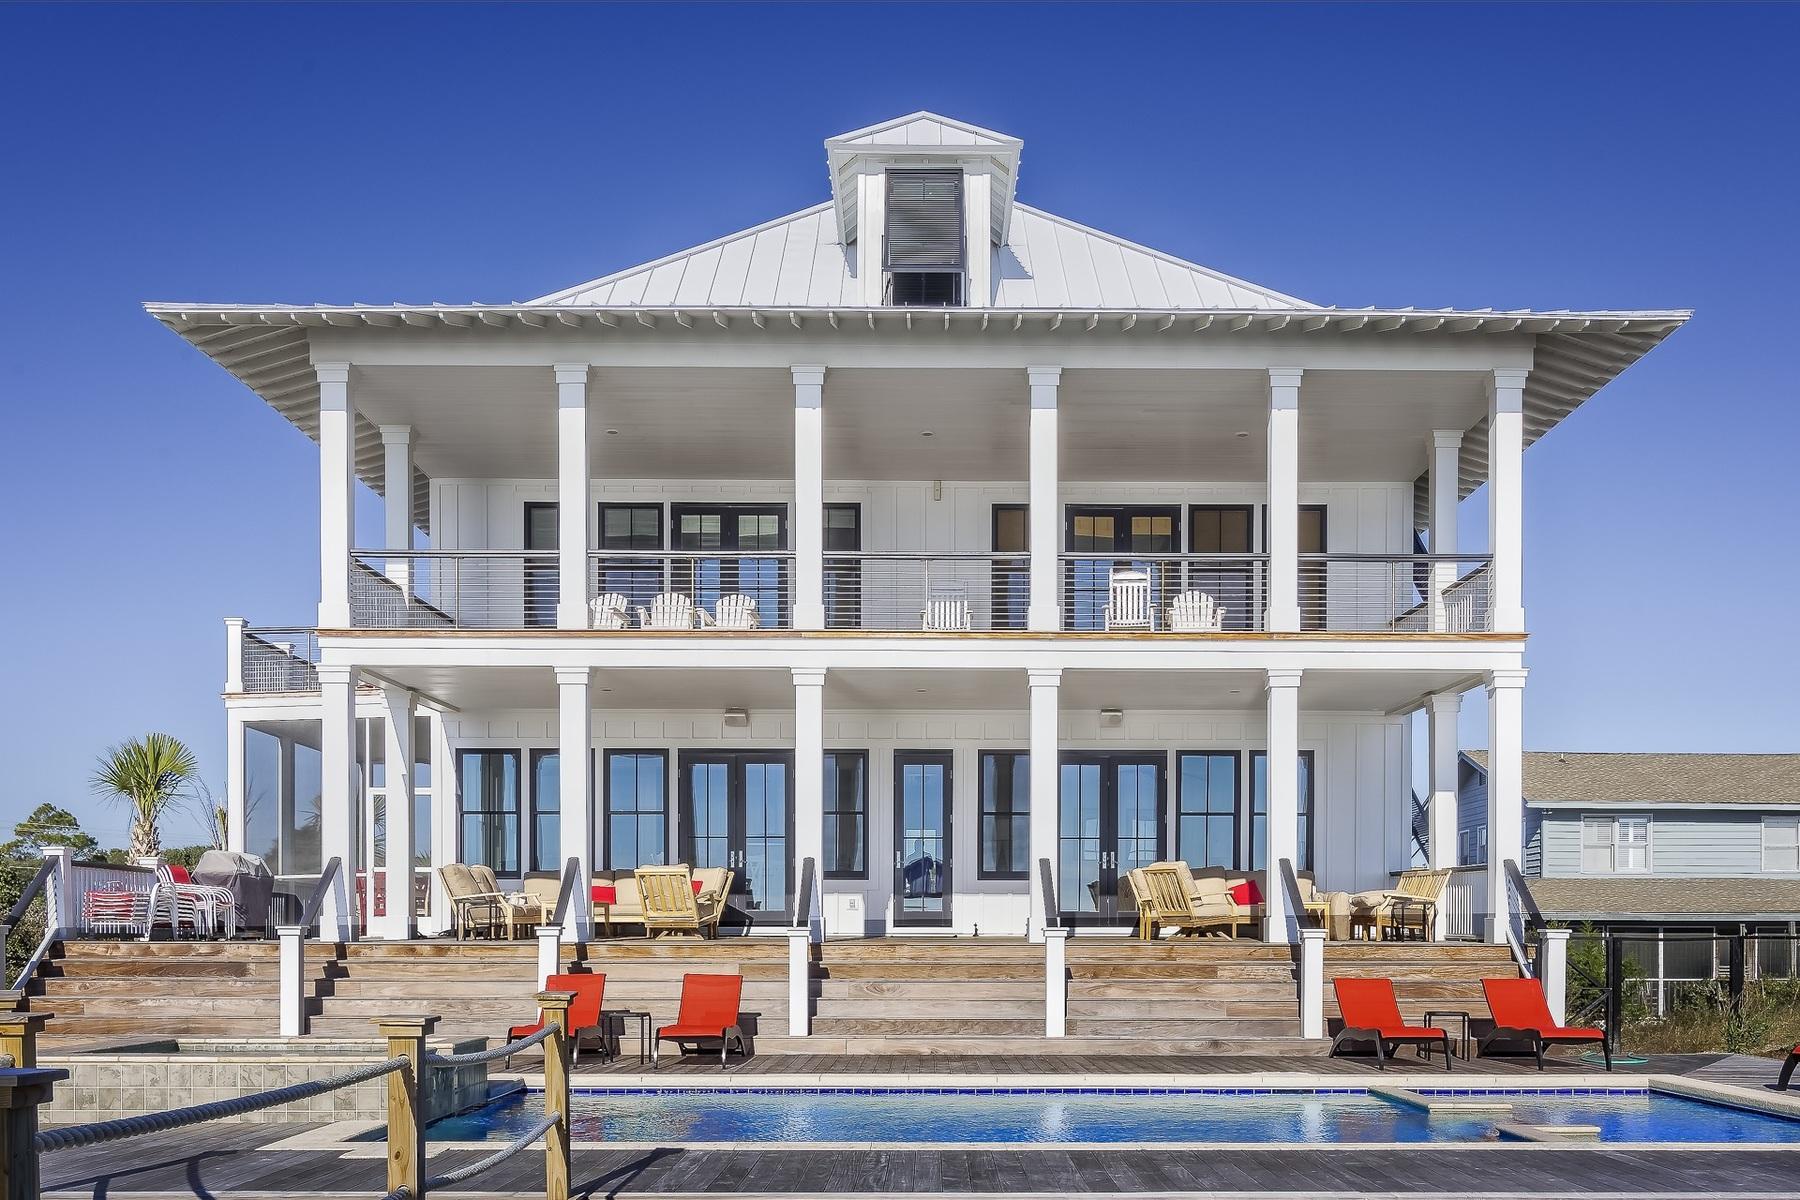 Vivienda en venta sujeta a comision inmobiliaria